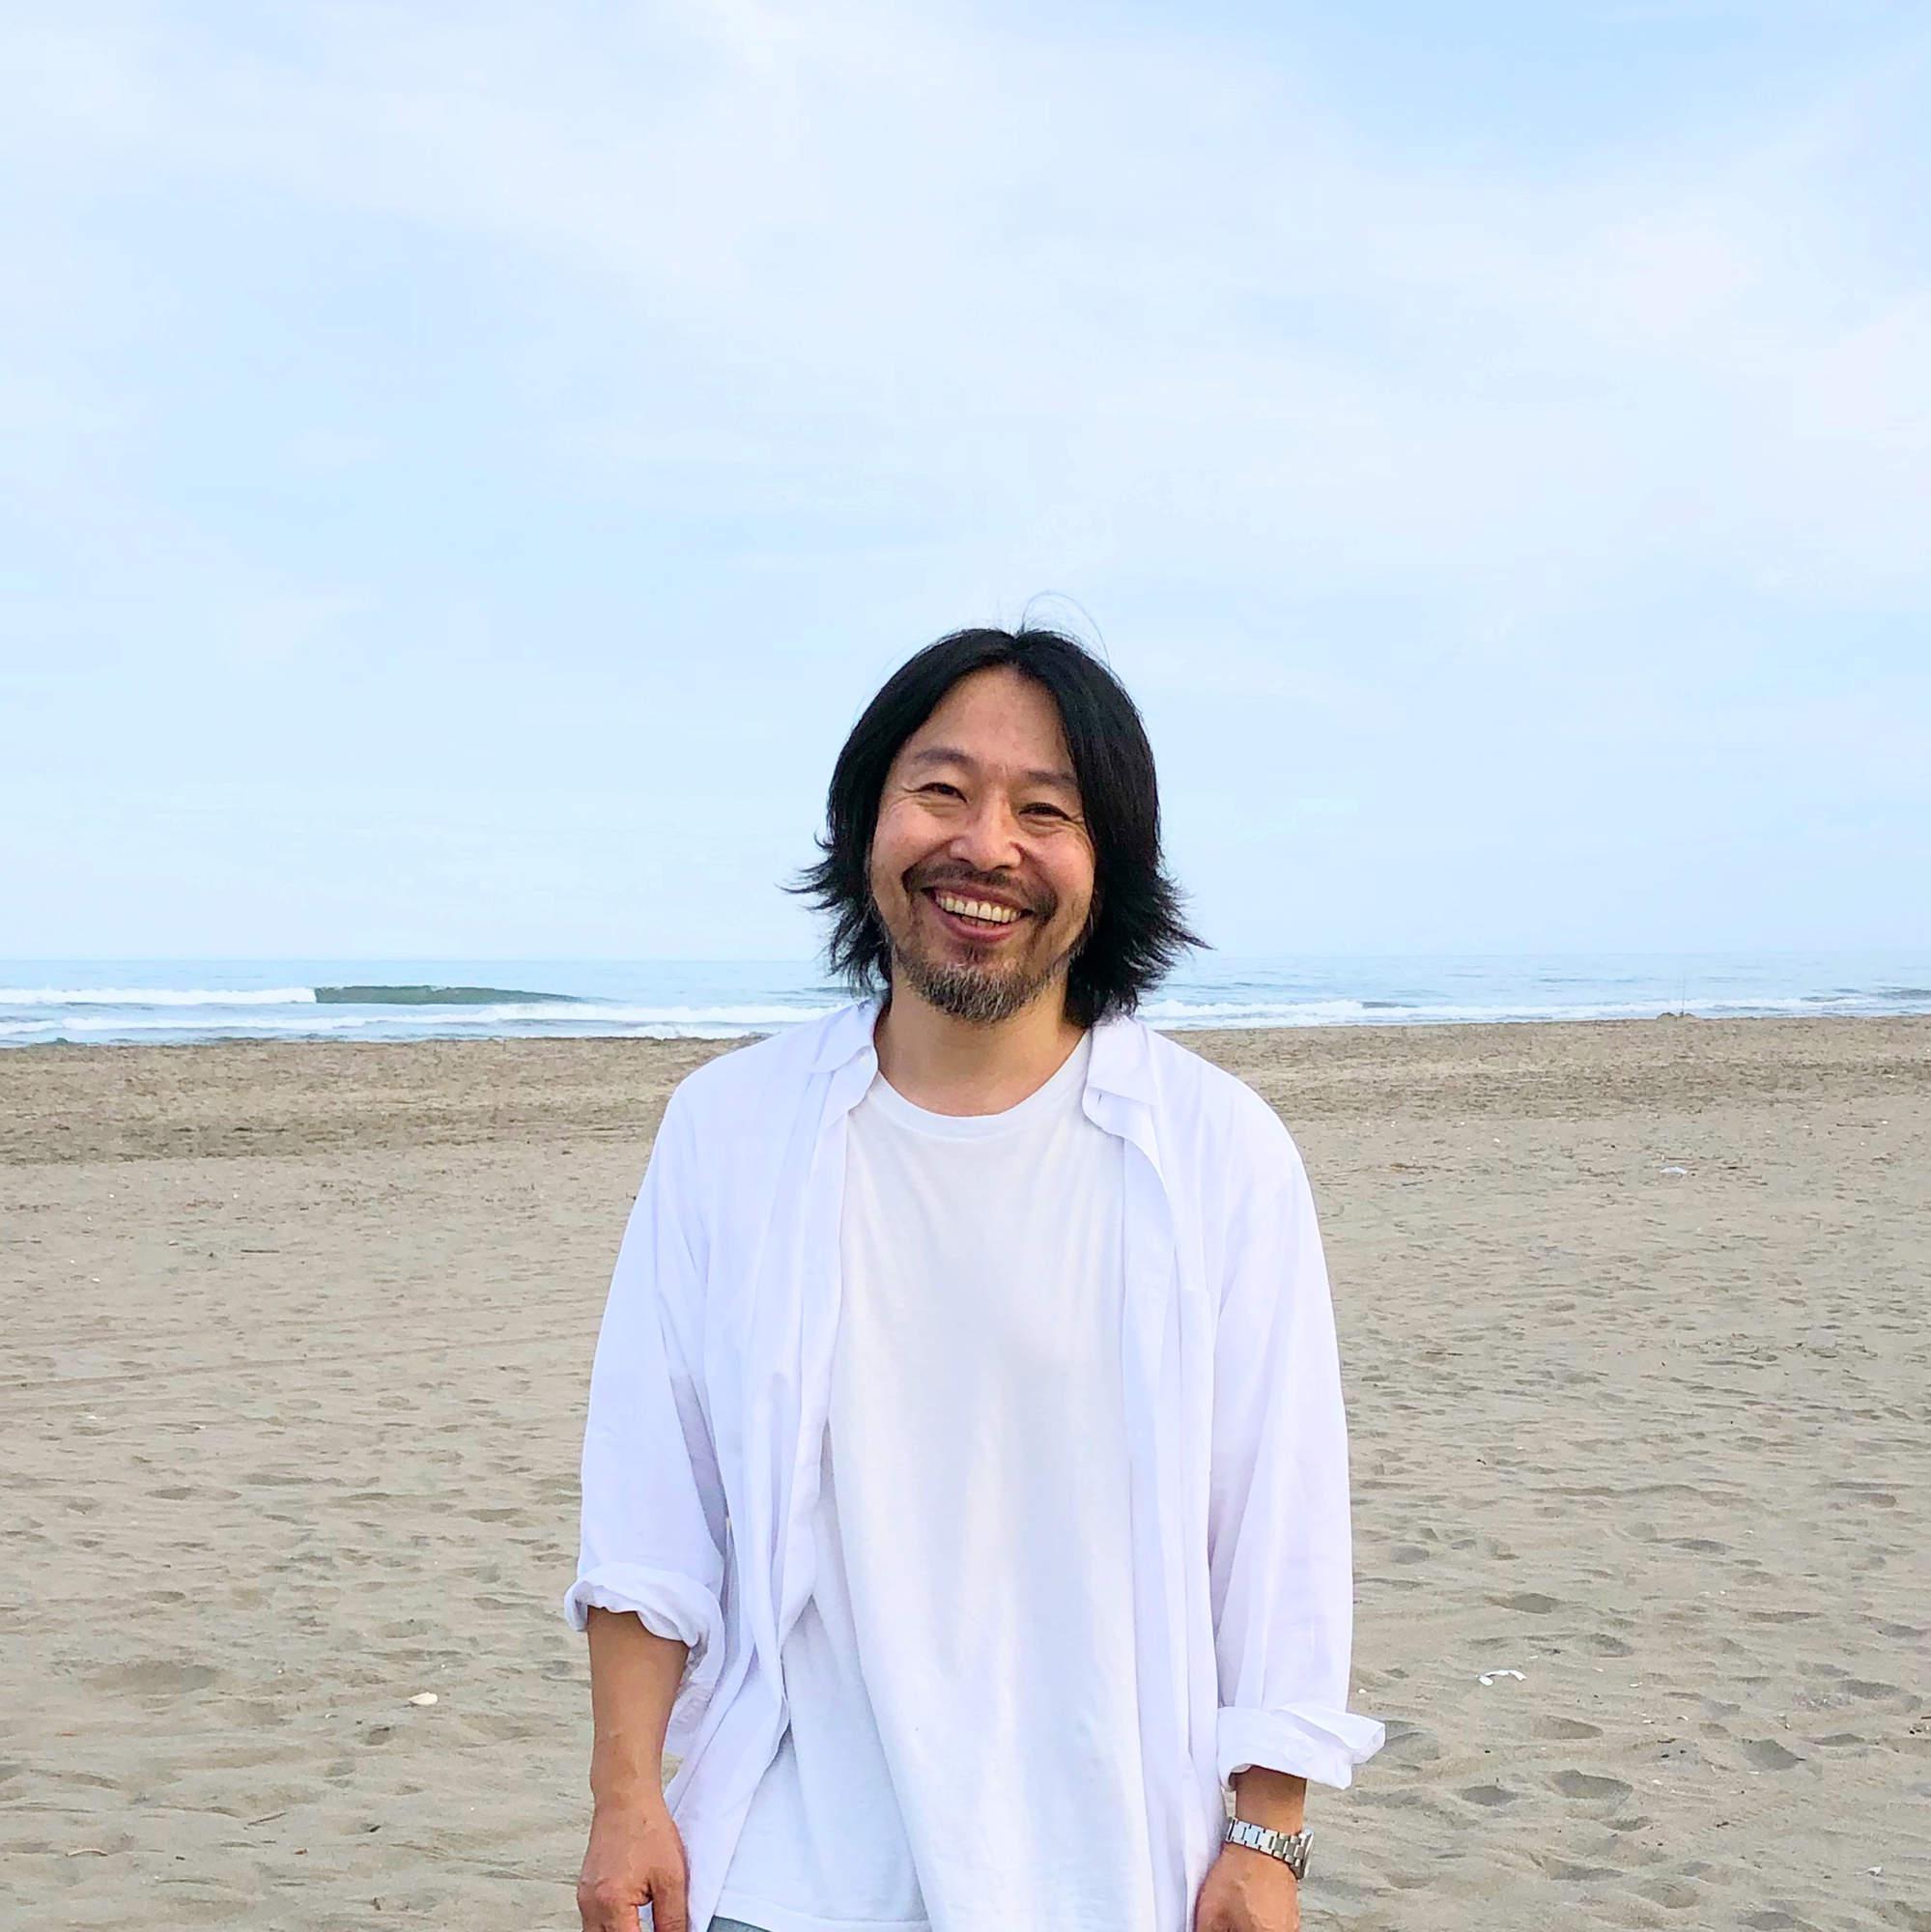 http://rose-records.jp/files/20200907180912.jpg